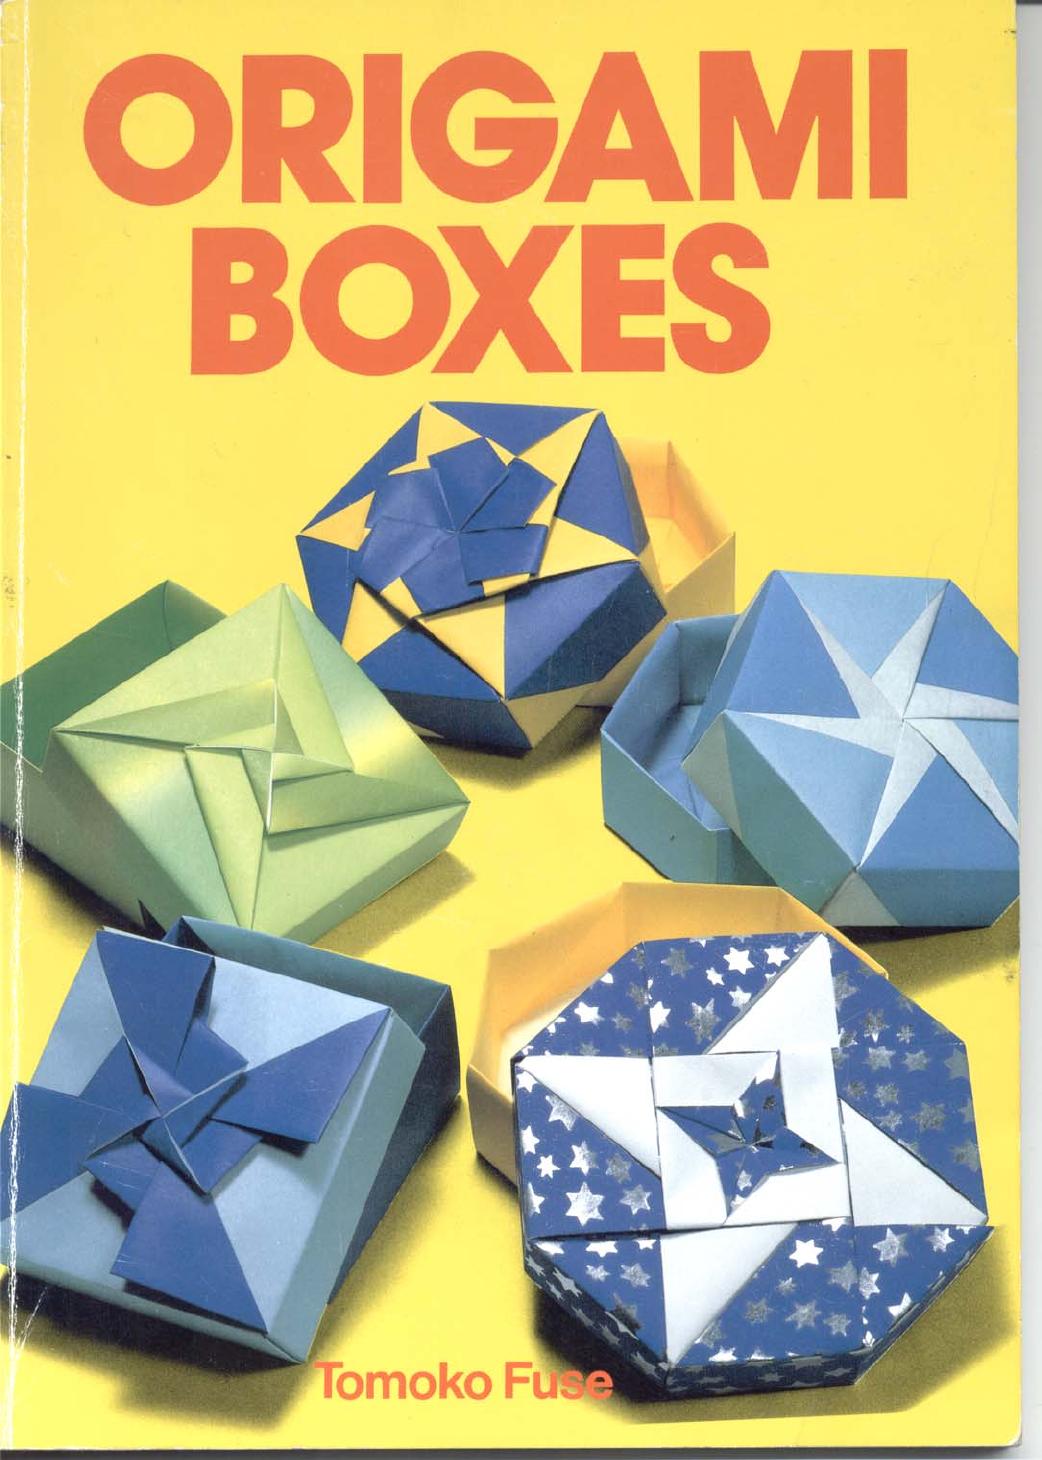 caixas de origami tomoko fuse documentos pinterest rh pinterest com Tommy Clancy Box Tomoko Fuse Tutorial Origami Boxes Tomoko Fuse S